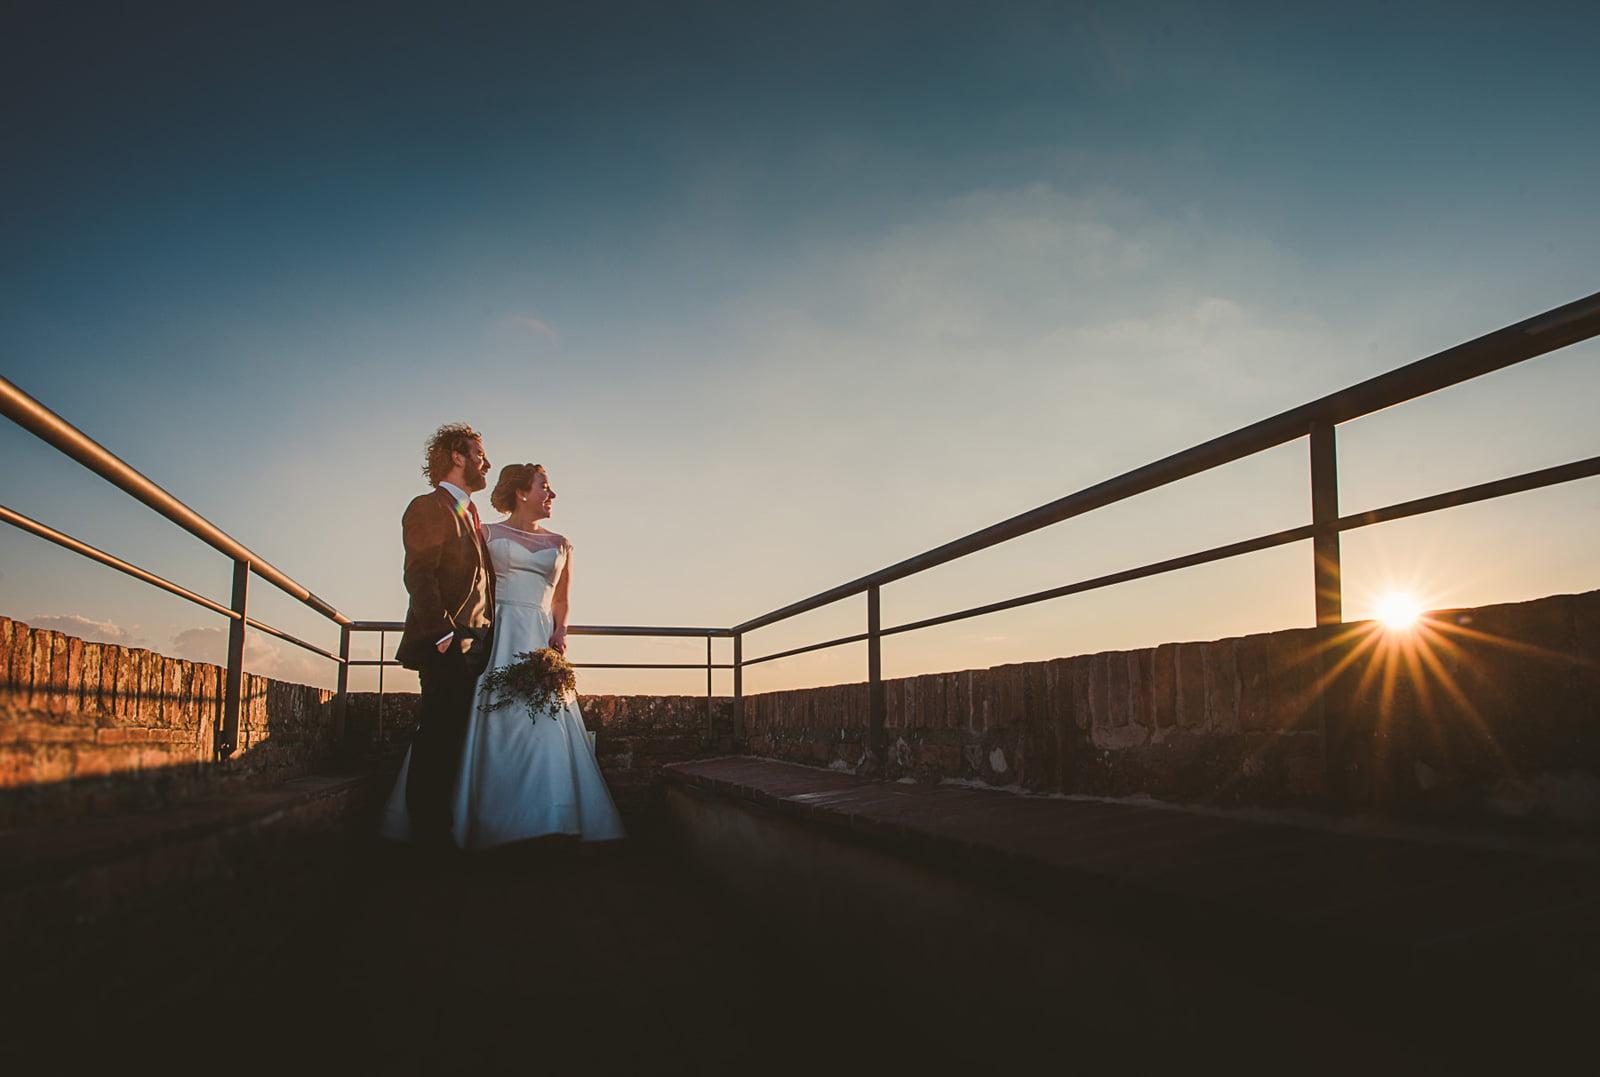 A+L Wedding At Siena Town Hall - By Federico Pannacci Wedding Photographer 111